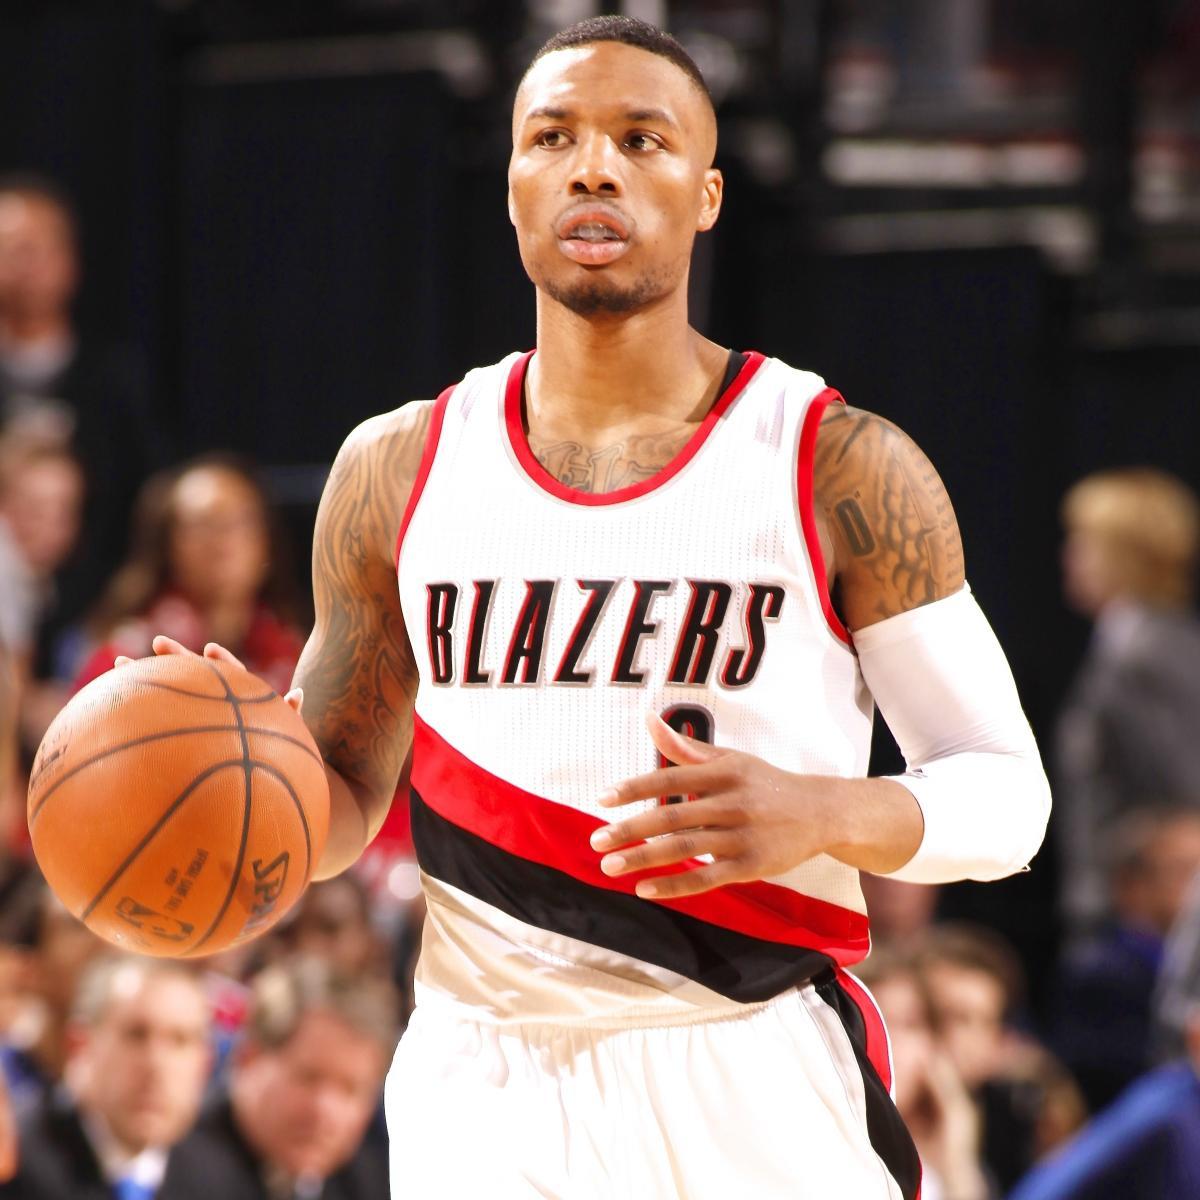 Blazers Score: Chicago Bulls Vs. Portland Trail Blazers: Live Score